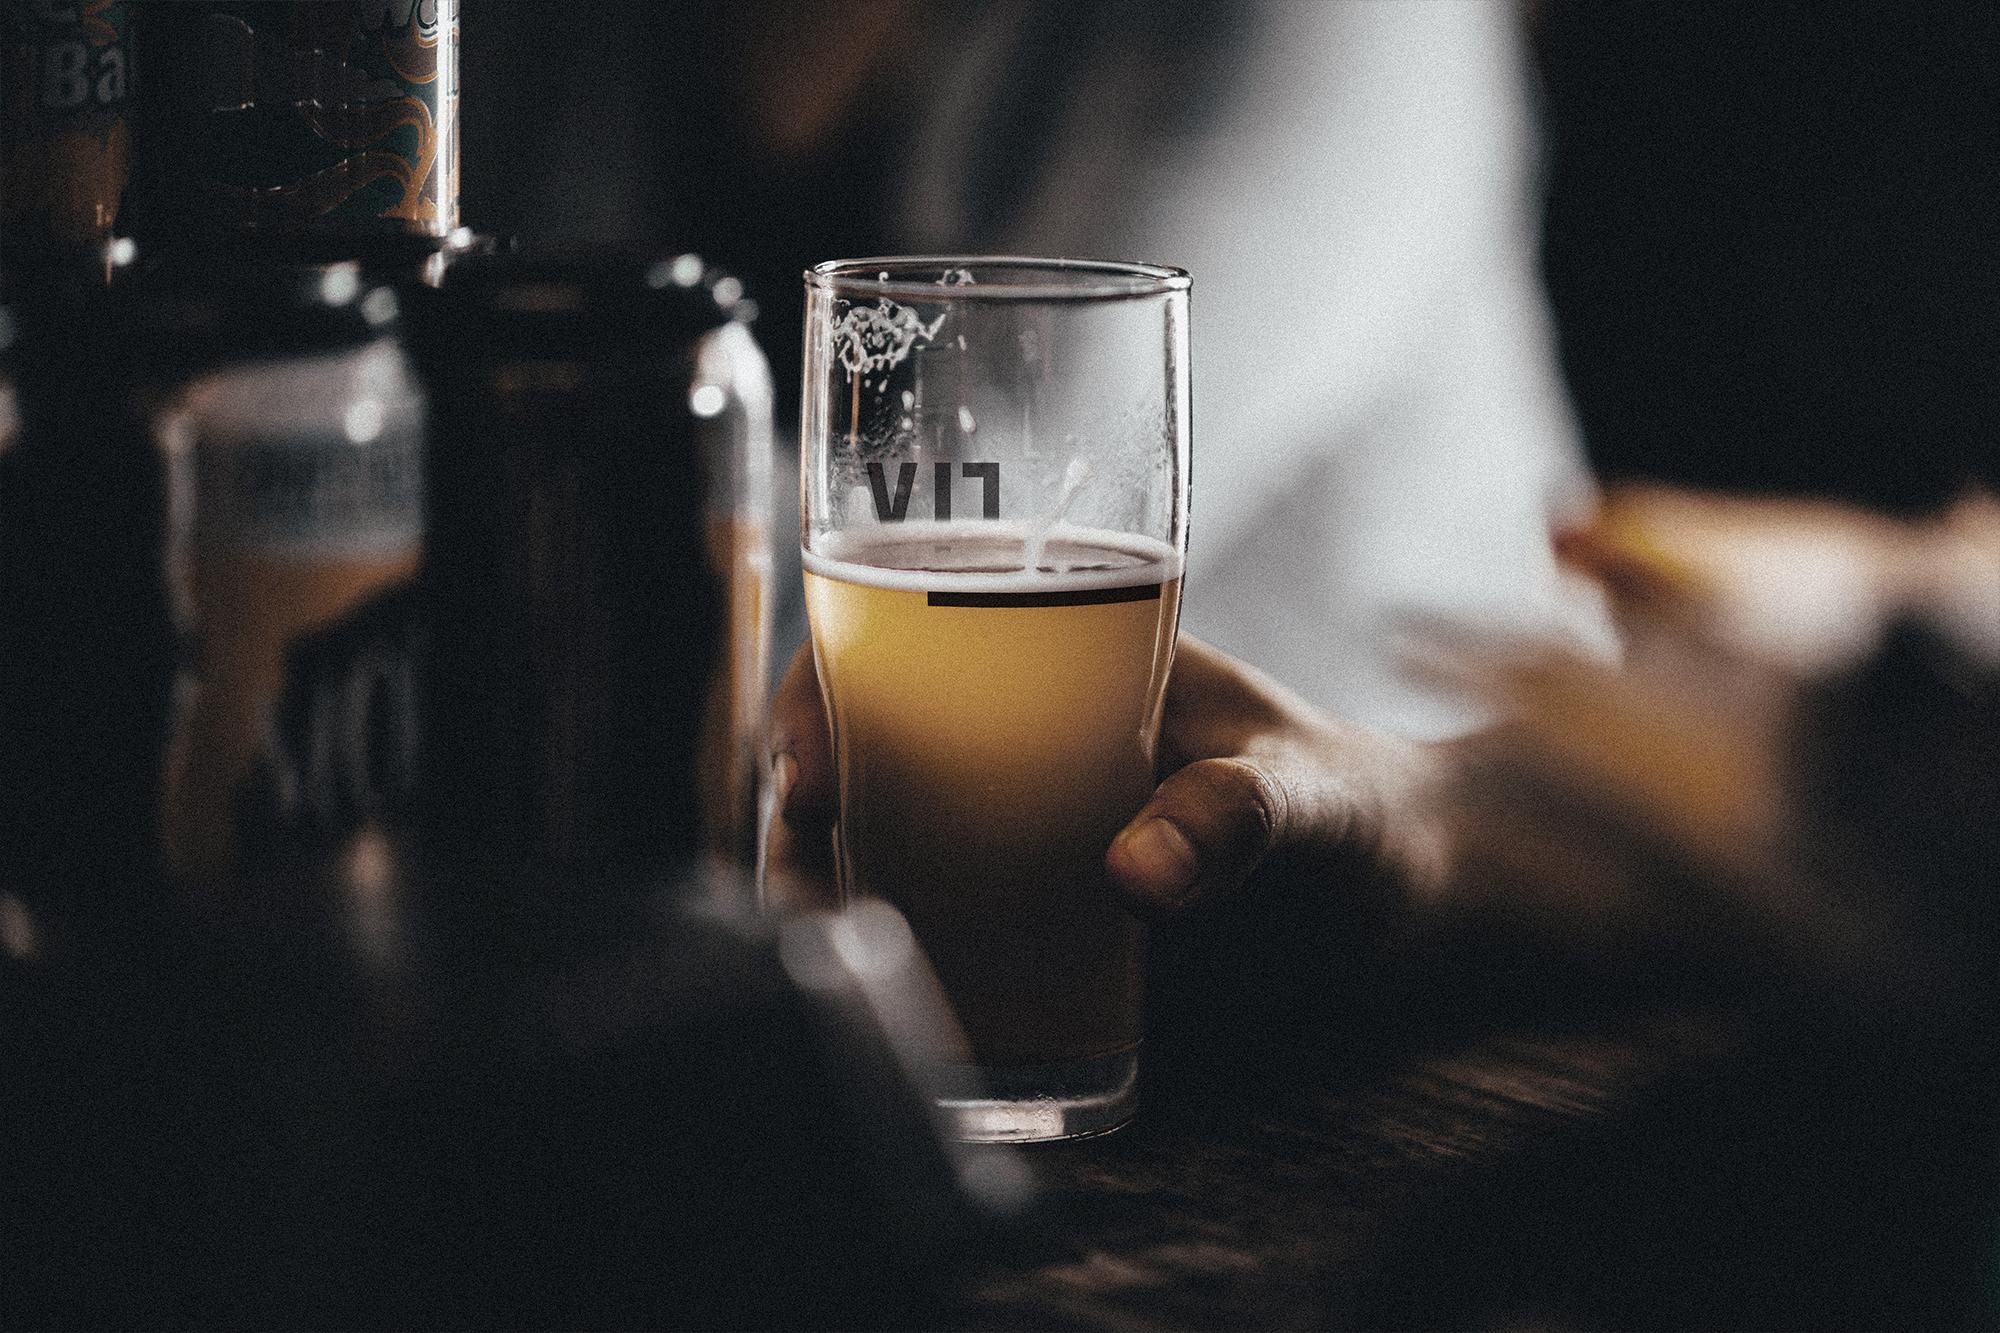 Barfly rebrand: Pint glass